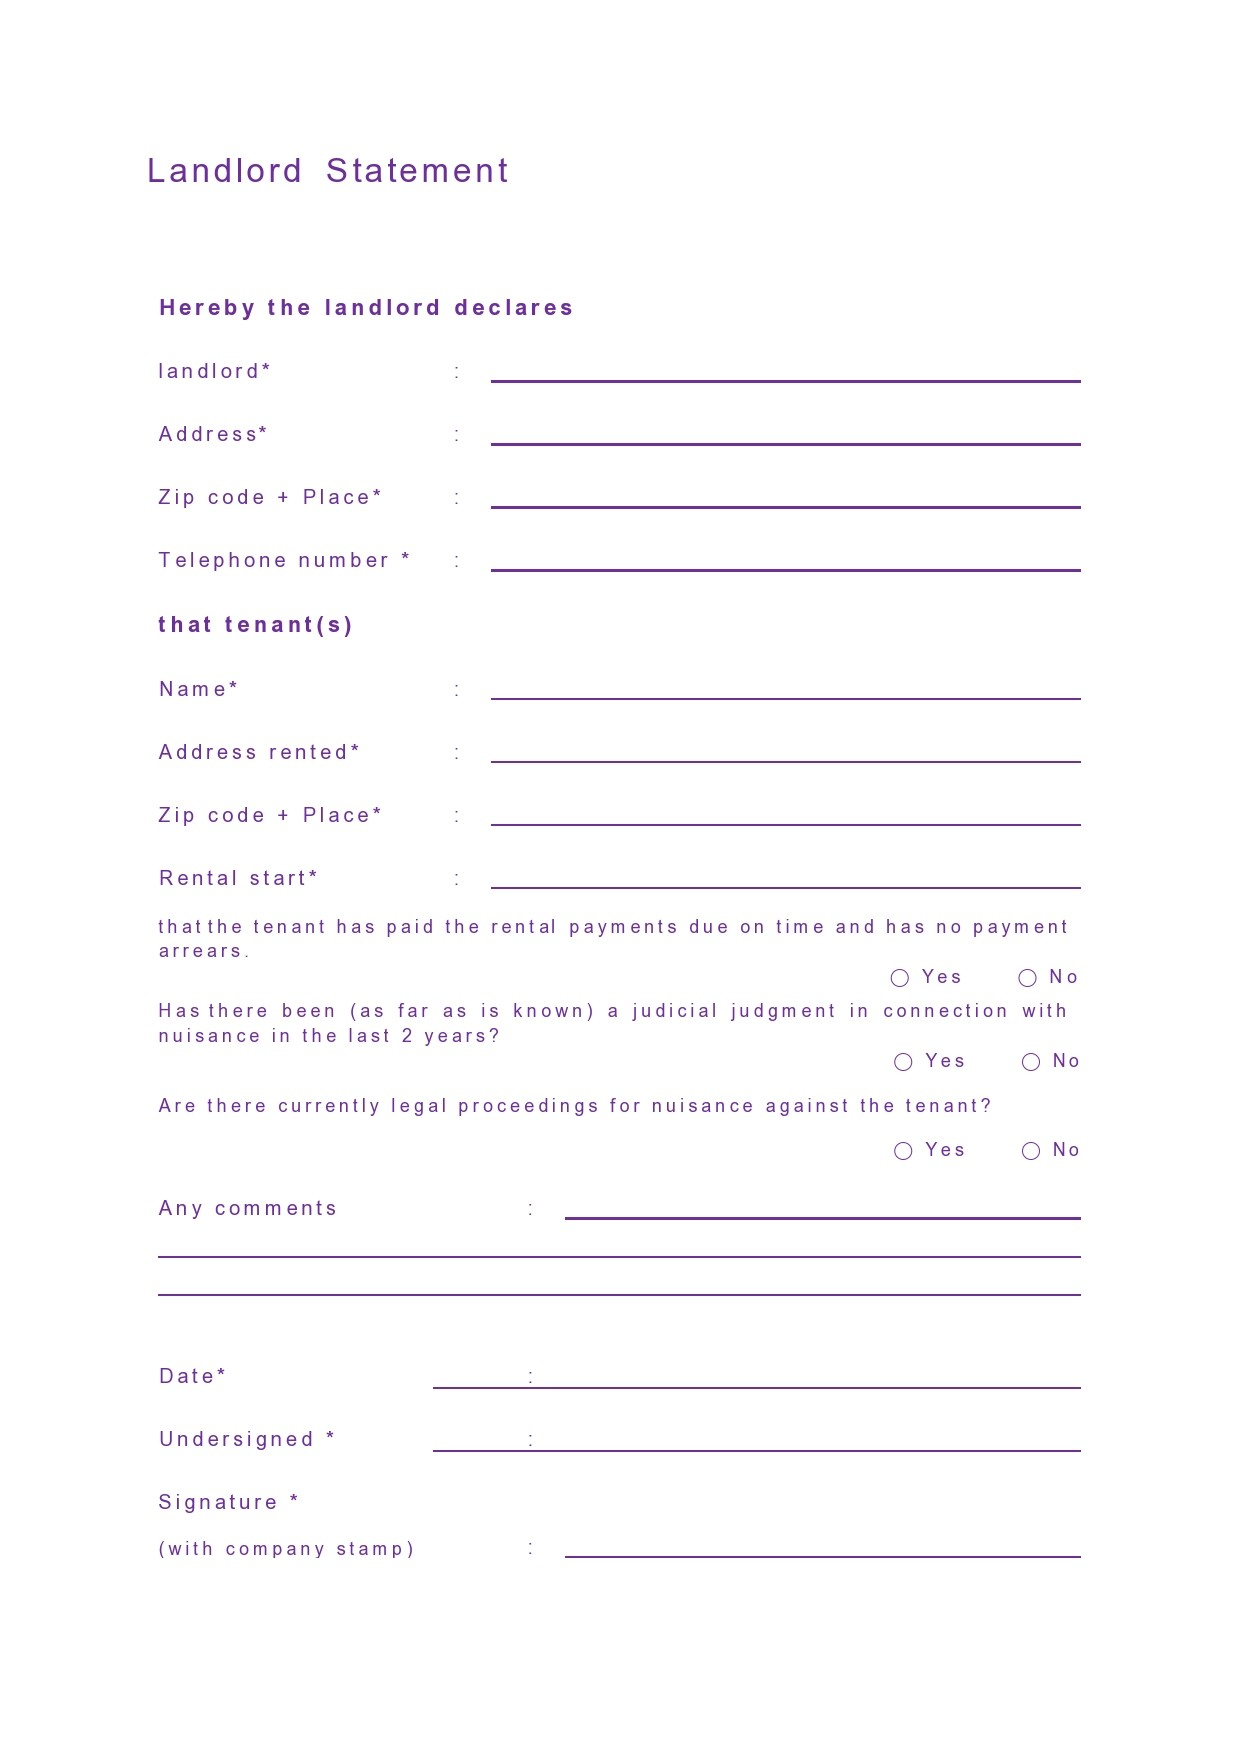 Free landlord statment 18